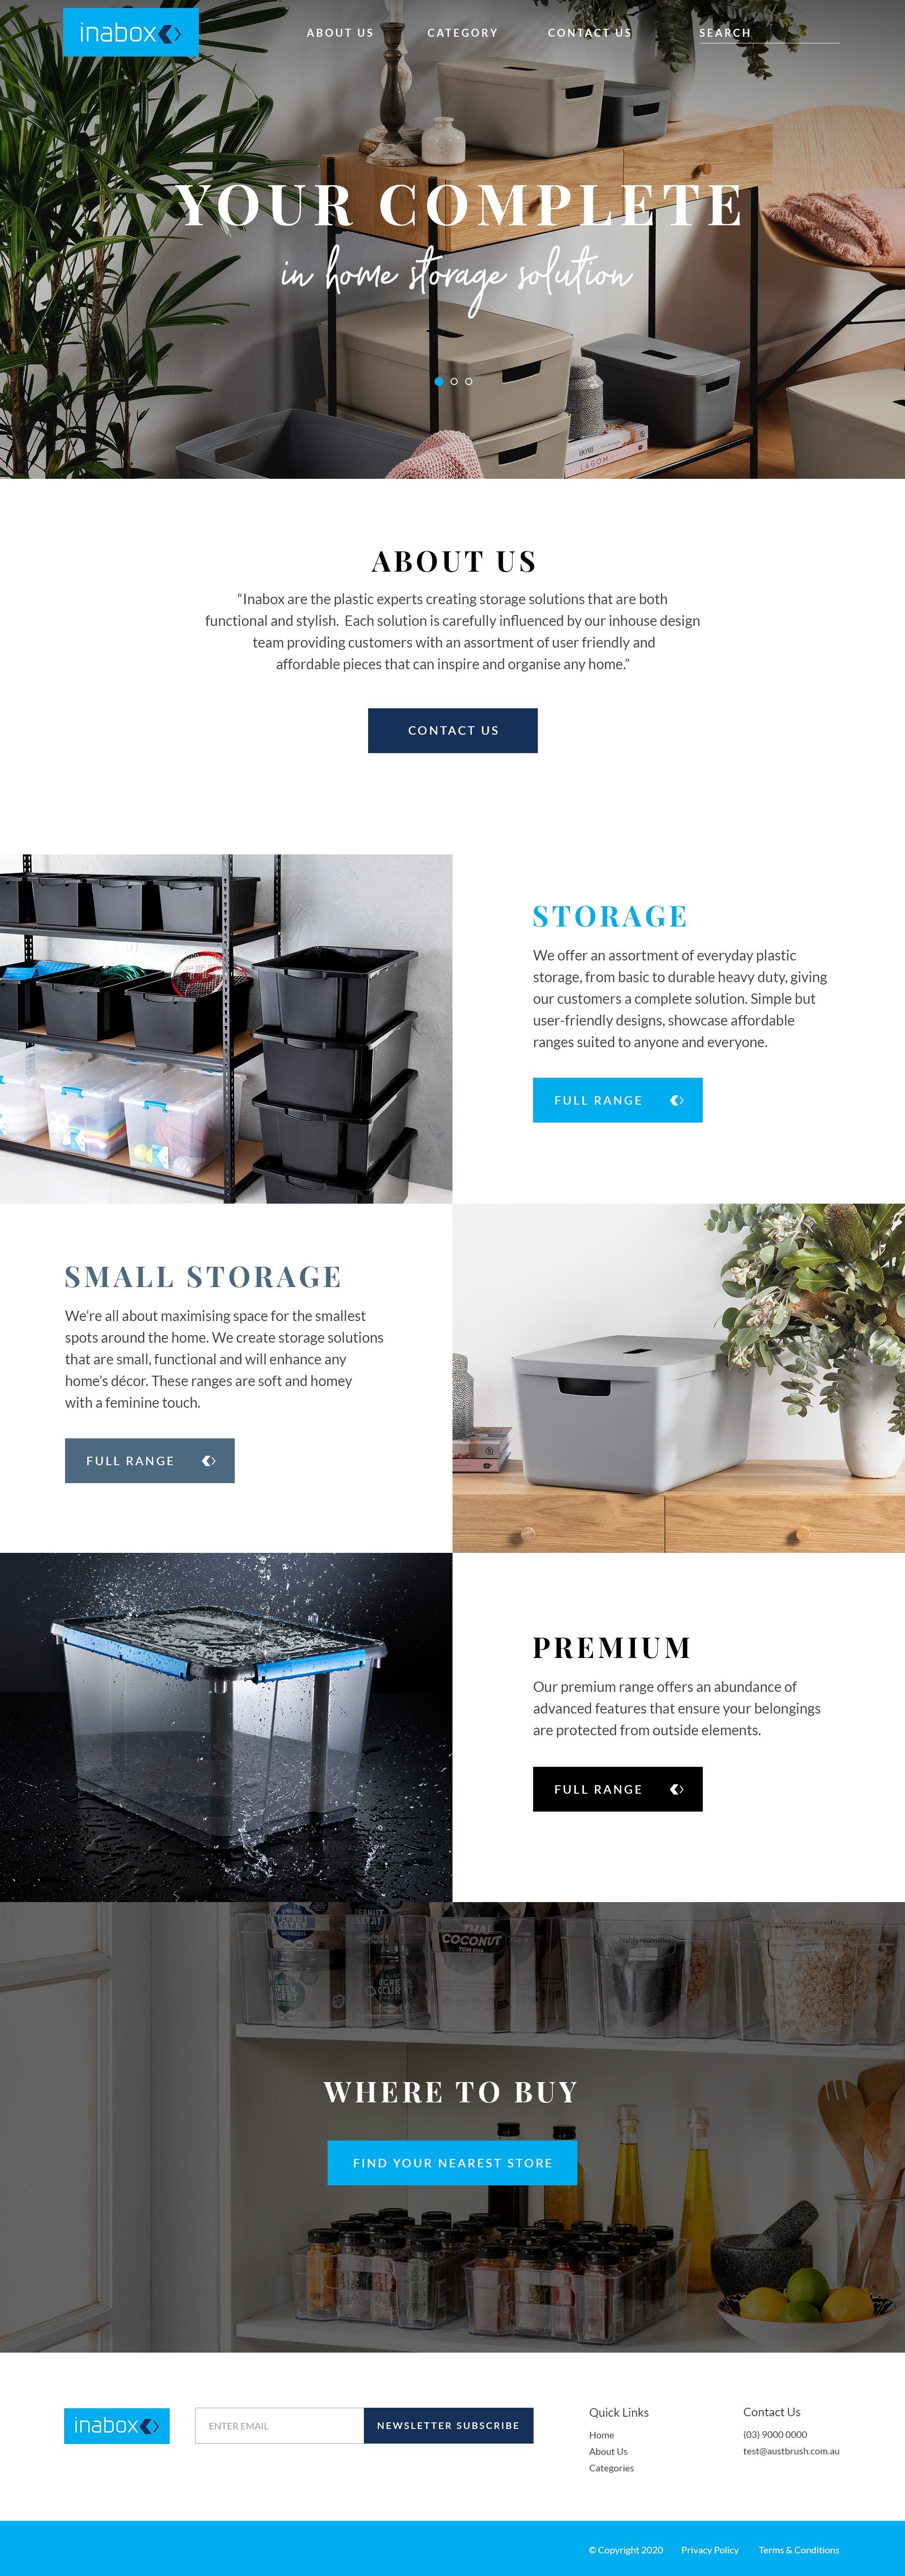 Web Design - Storage